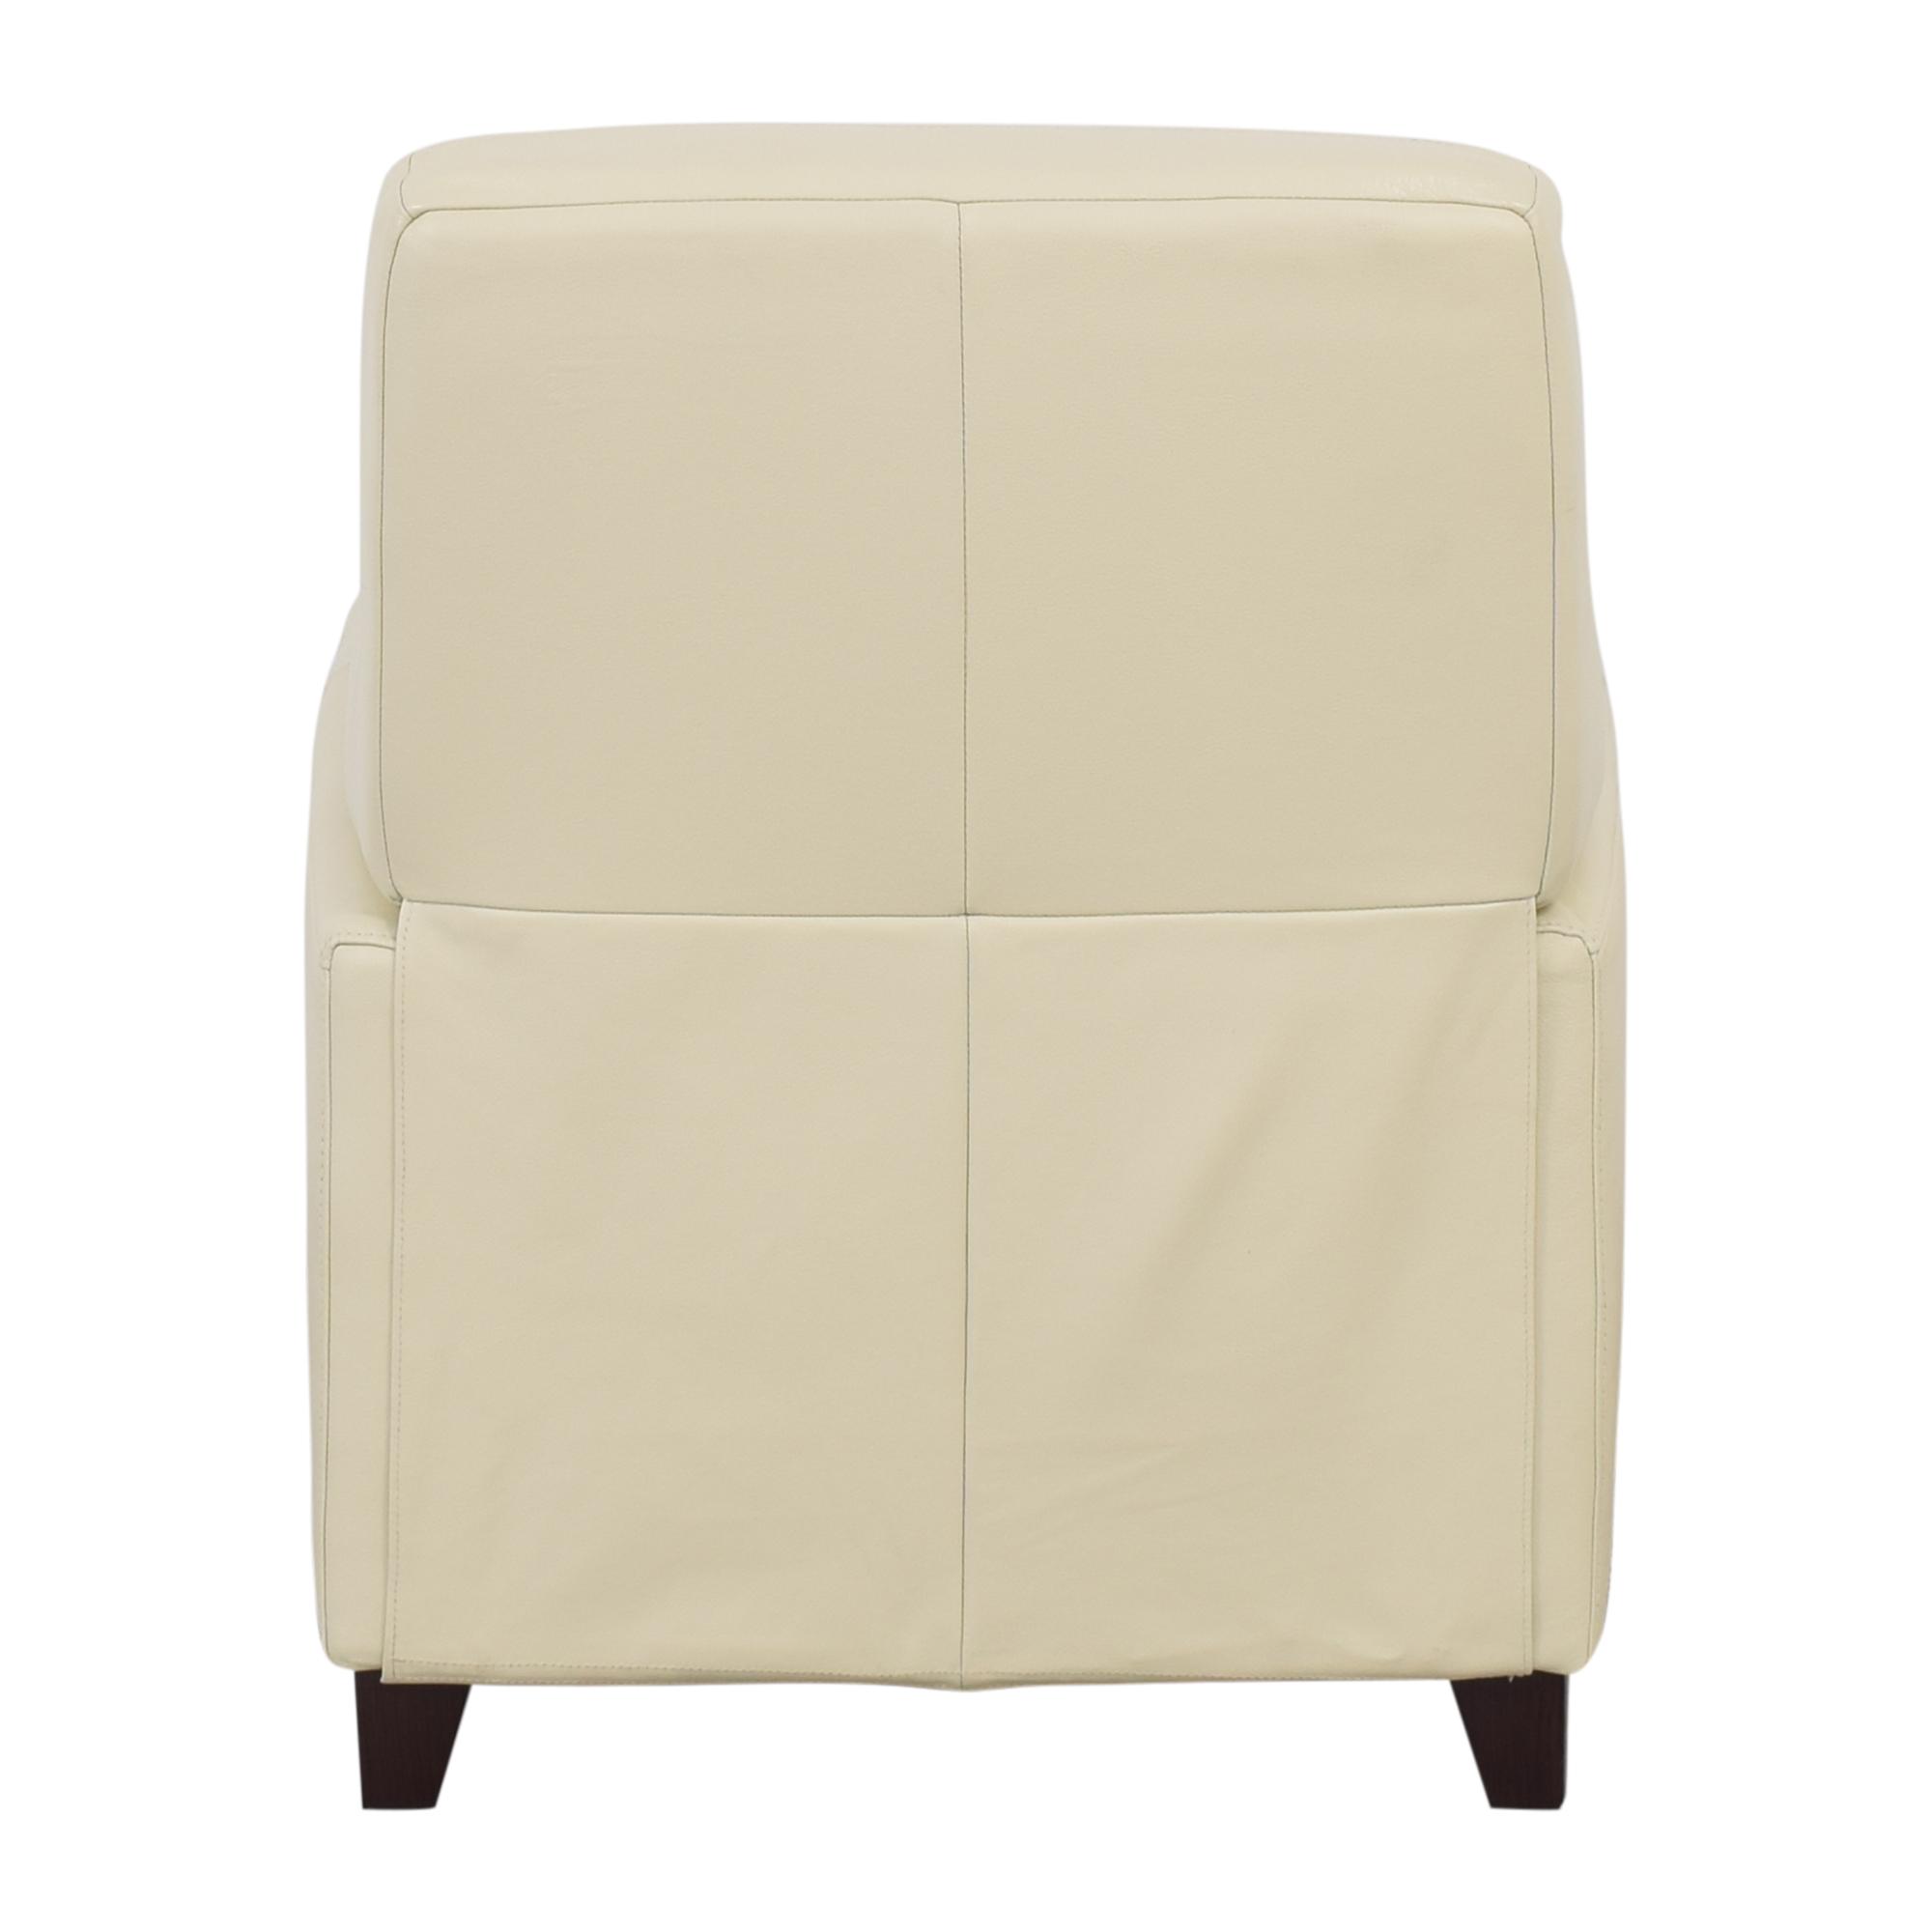 Macy's Macy's Myia Pushback Reclining Chair coupon